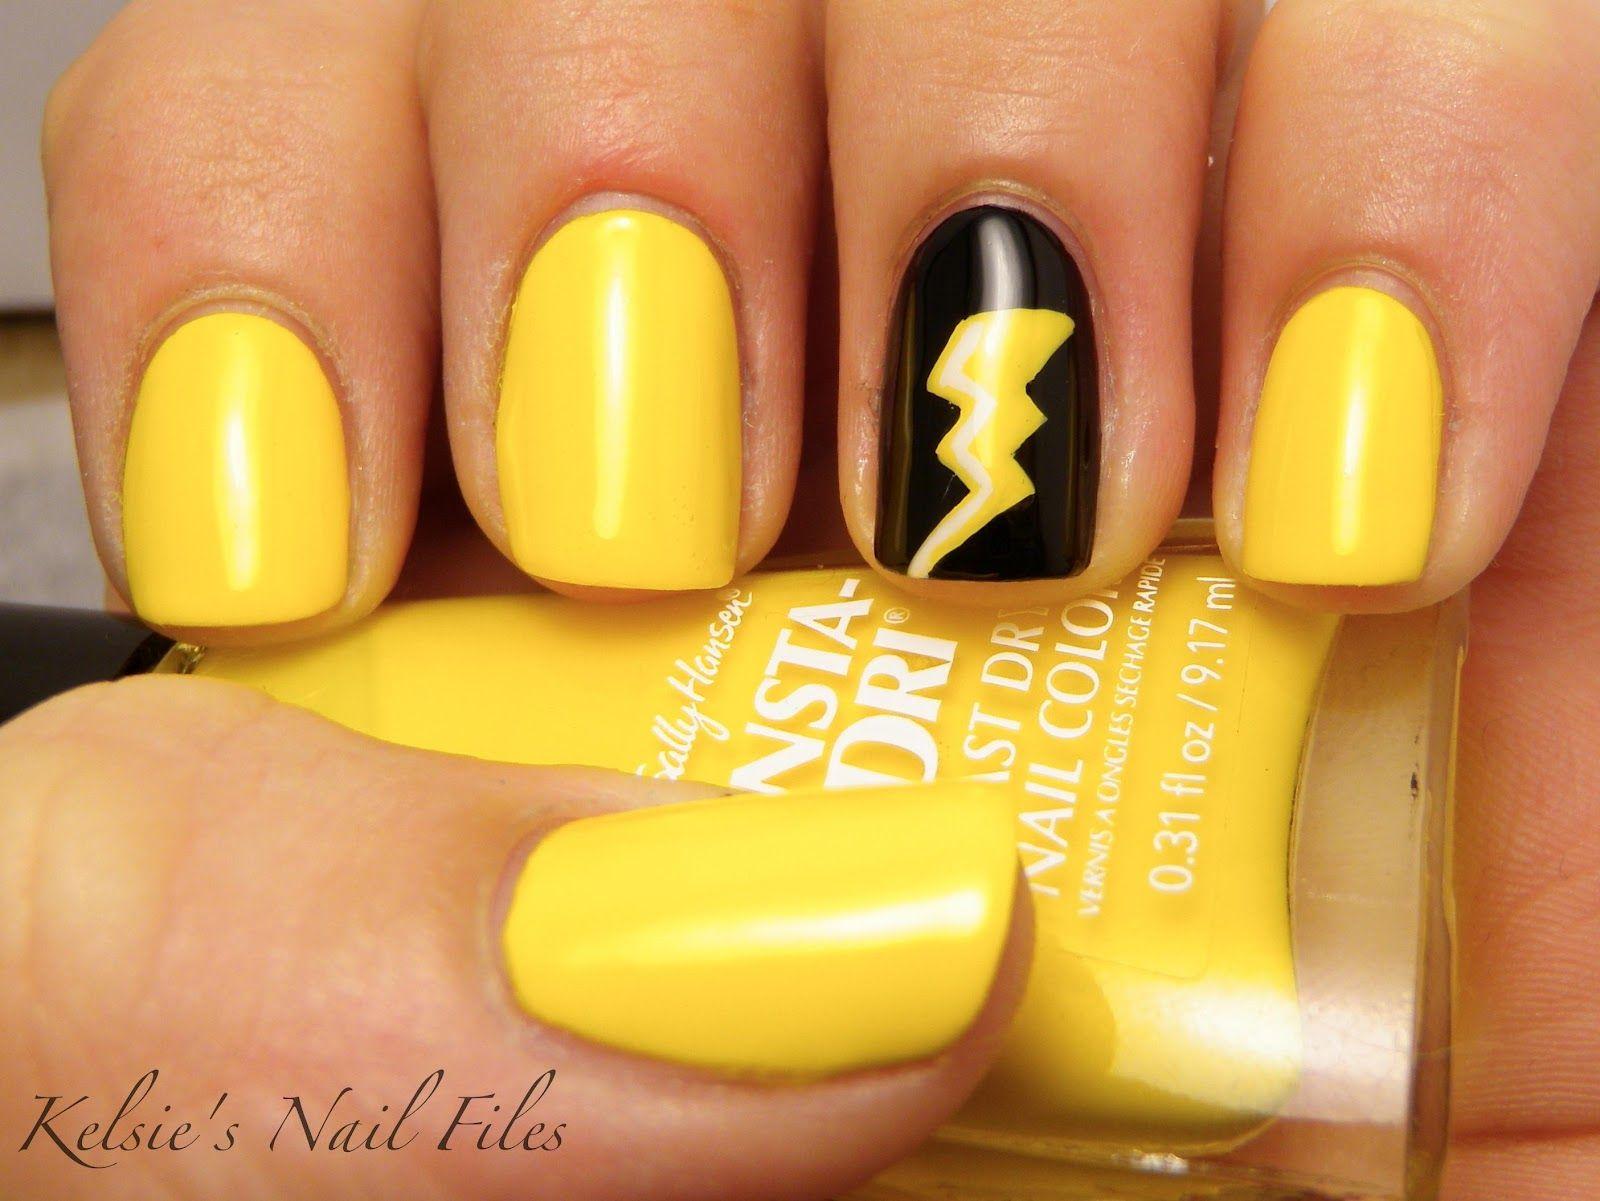 Yellow Nail Polish Designs   ... Paints Paper Mache. The bolt was ...